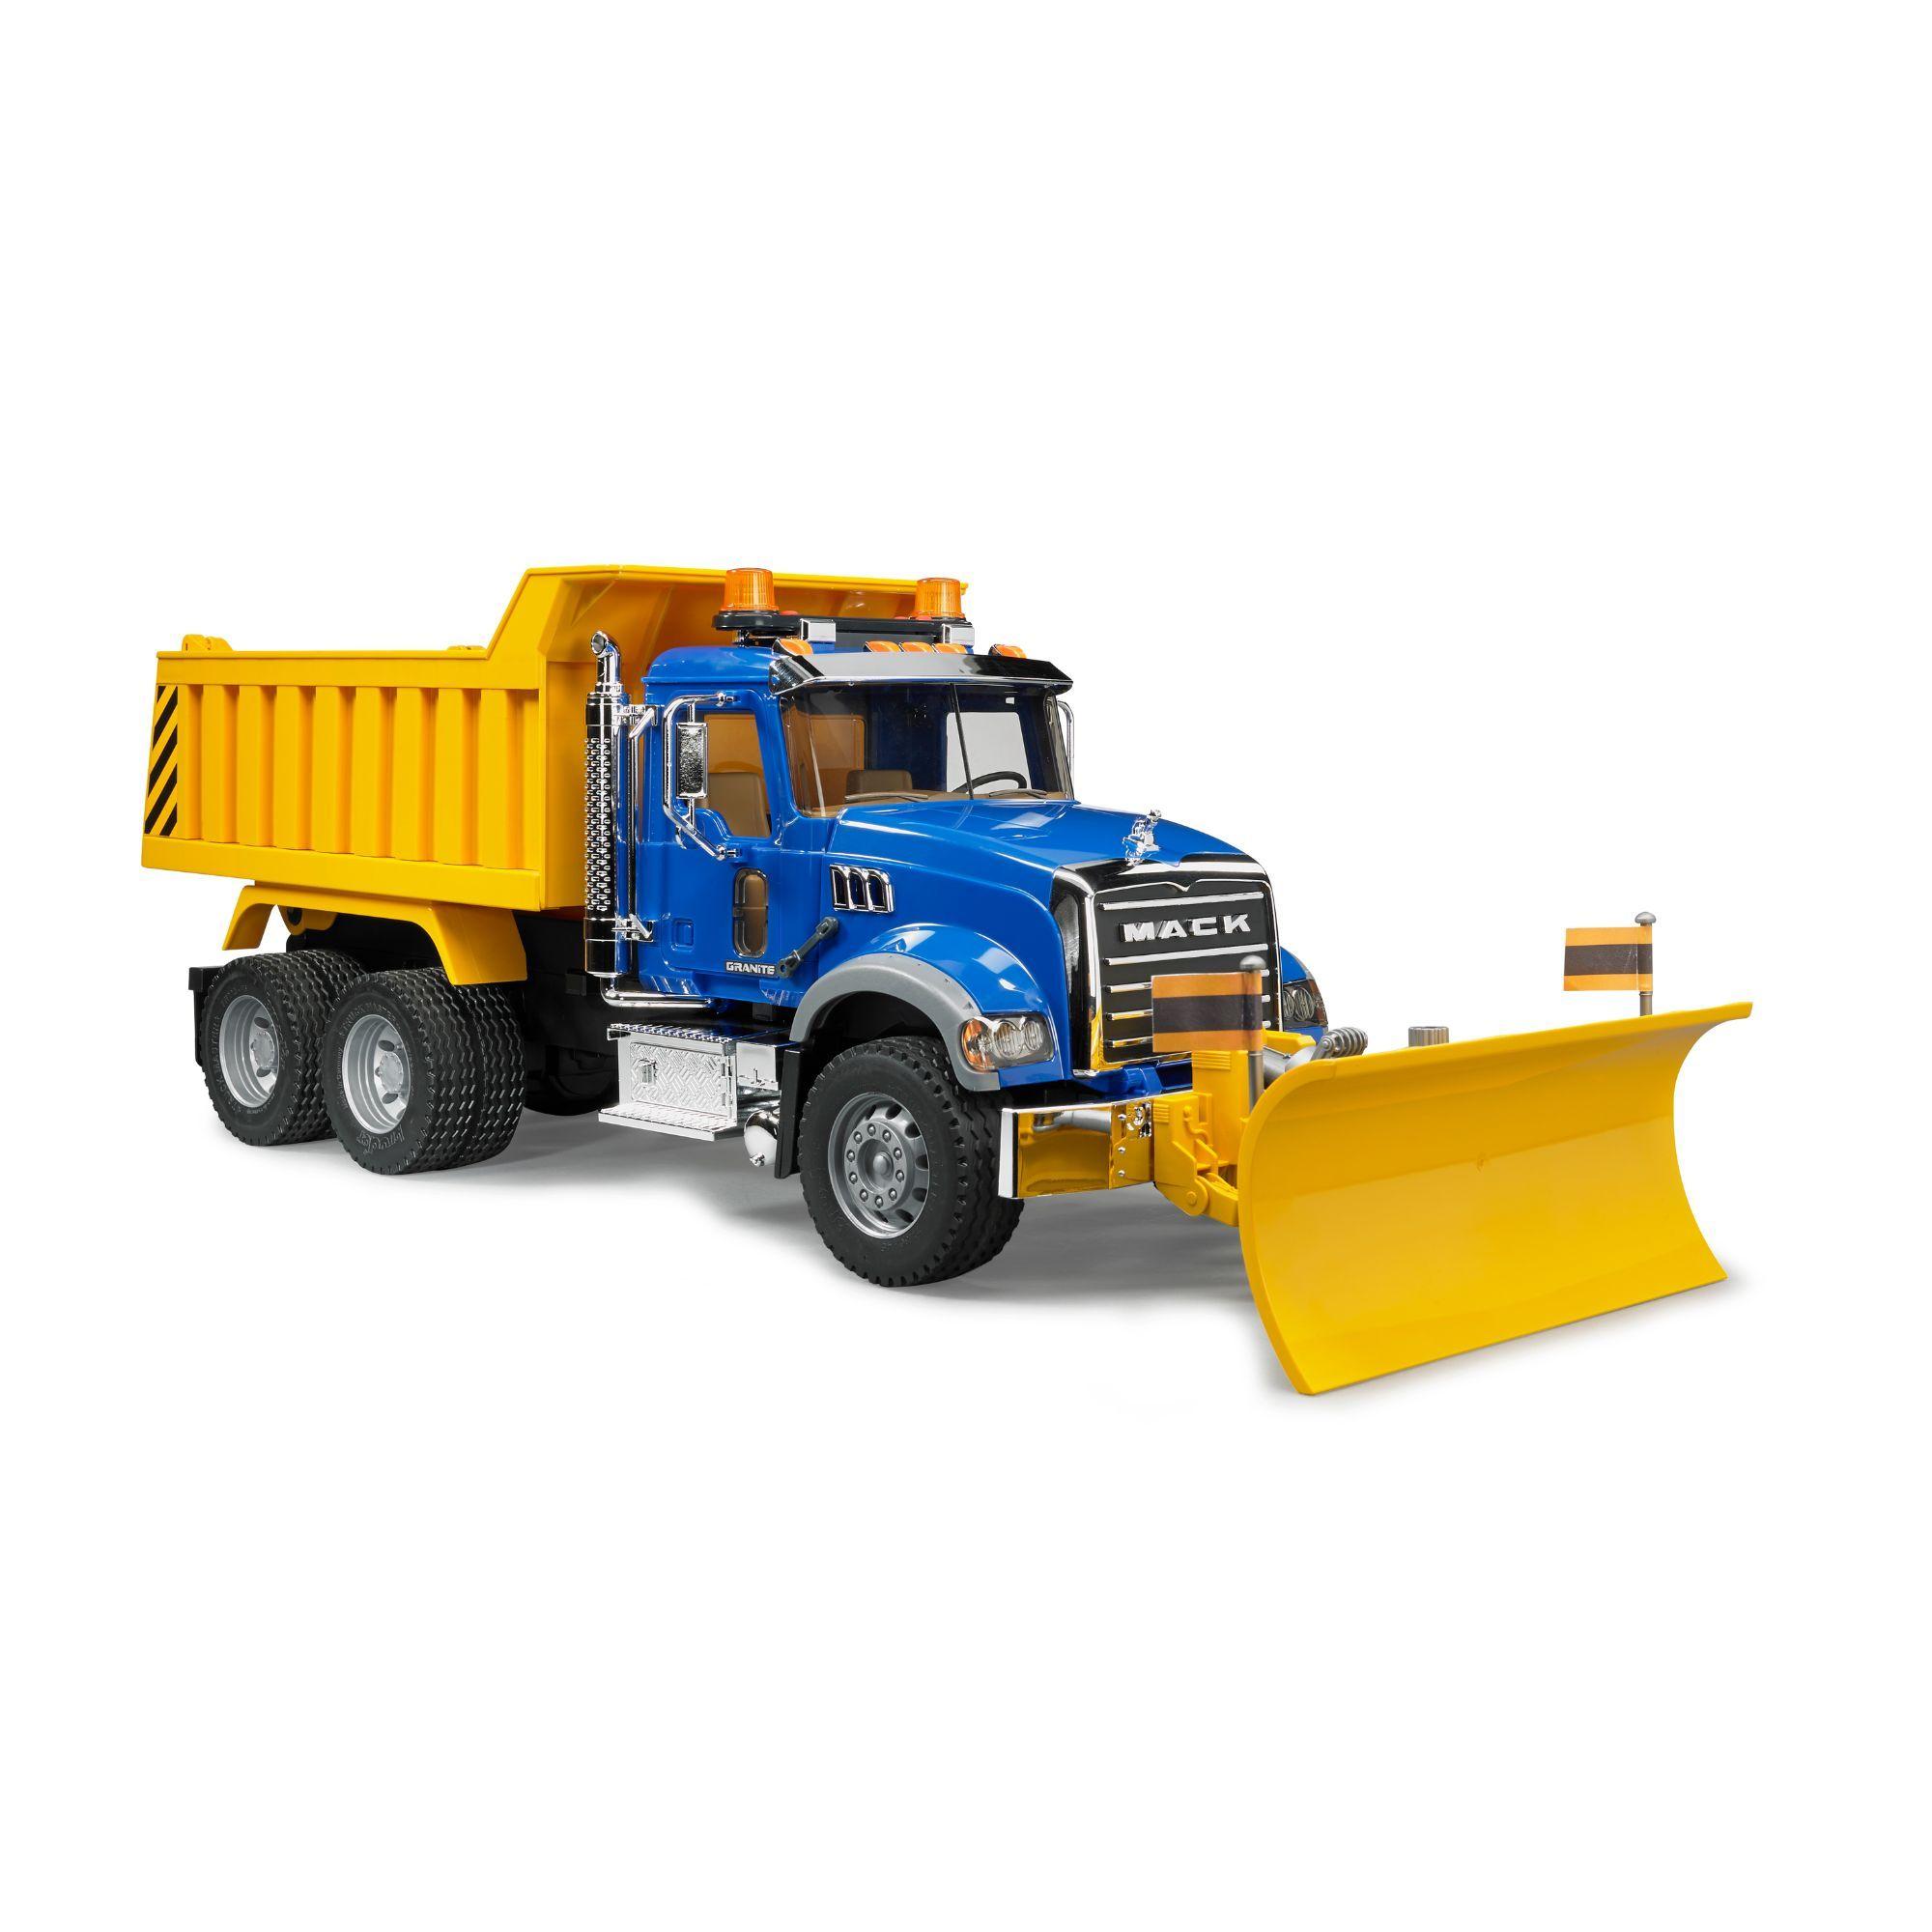 Bruder Mack Granite Dump Truck With Snow Plow Blade Walmart Com In 2020 Trucks Snow Plow Toy Trucks